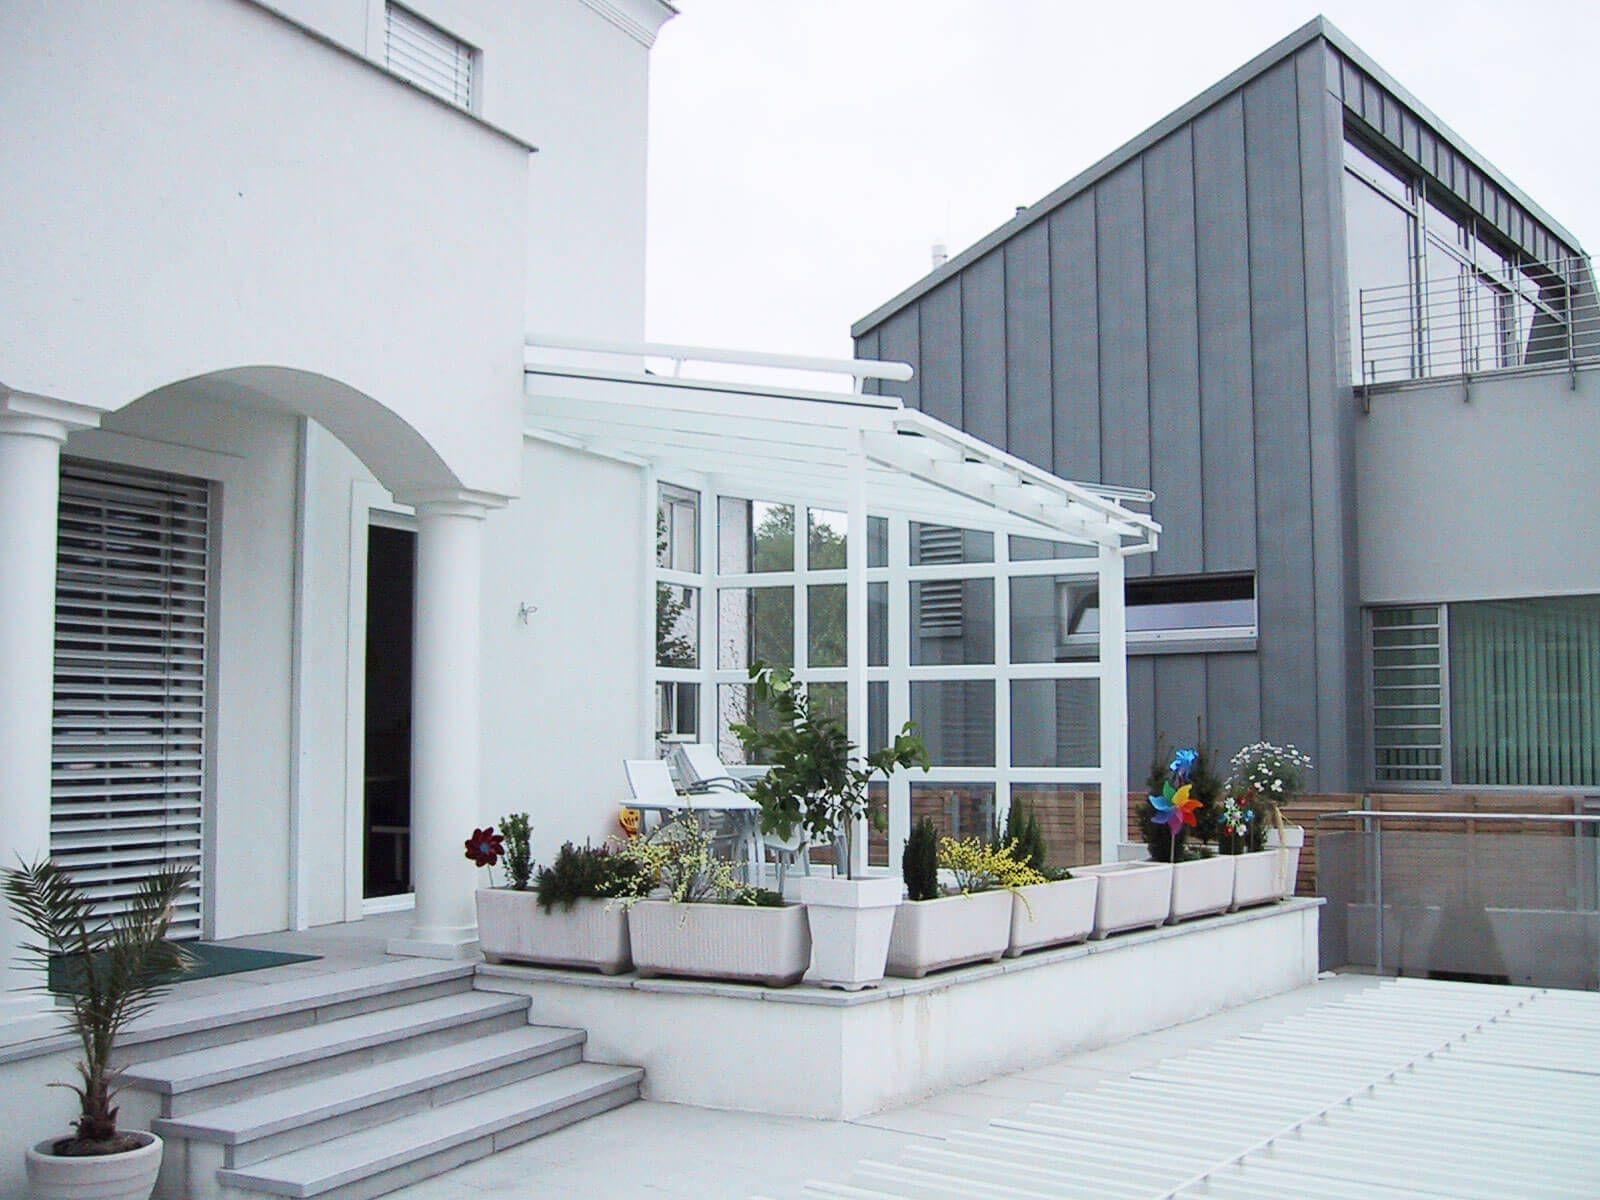 Terrassenuberdachung Alu Glas Fur Windgeschutzte Terrassen Balkone